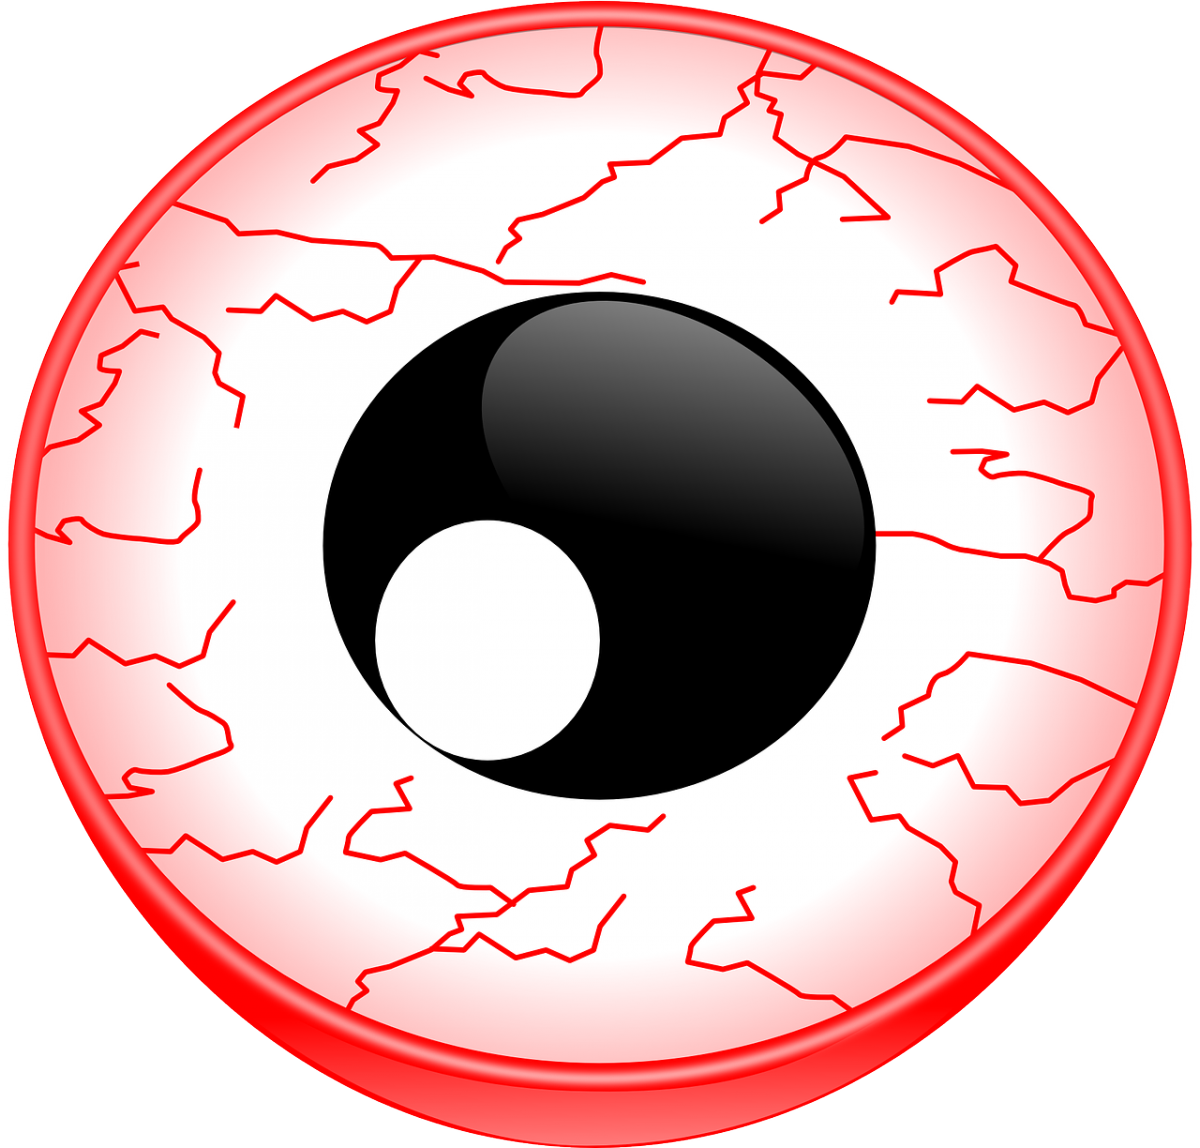 Eyes clipart illustration. Pink bloodshot eye free